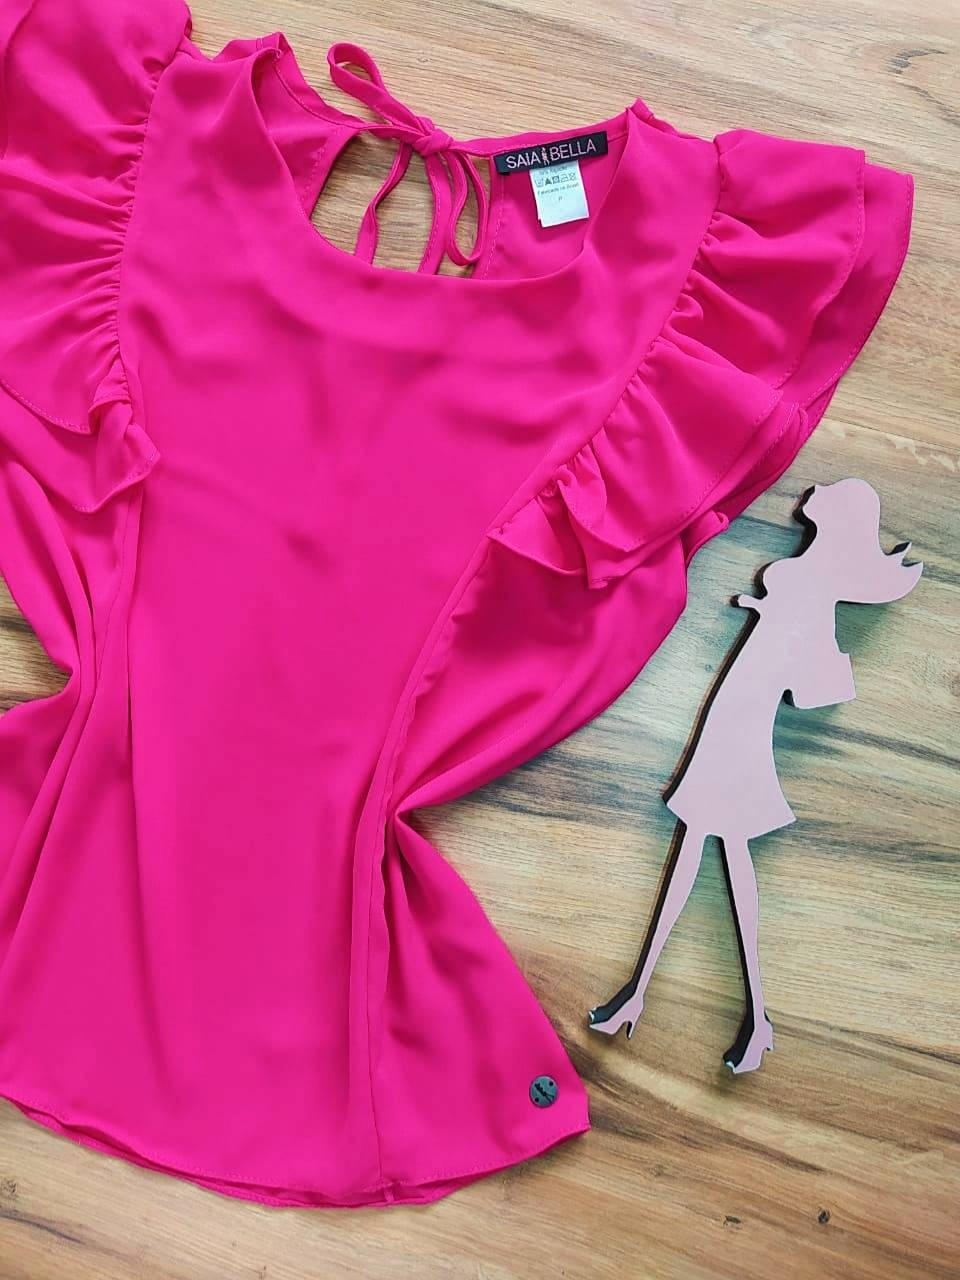 Blusa Beatriz Saia Bella - SB51074140 pink